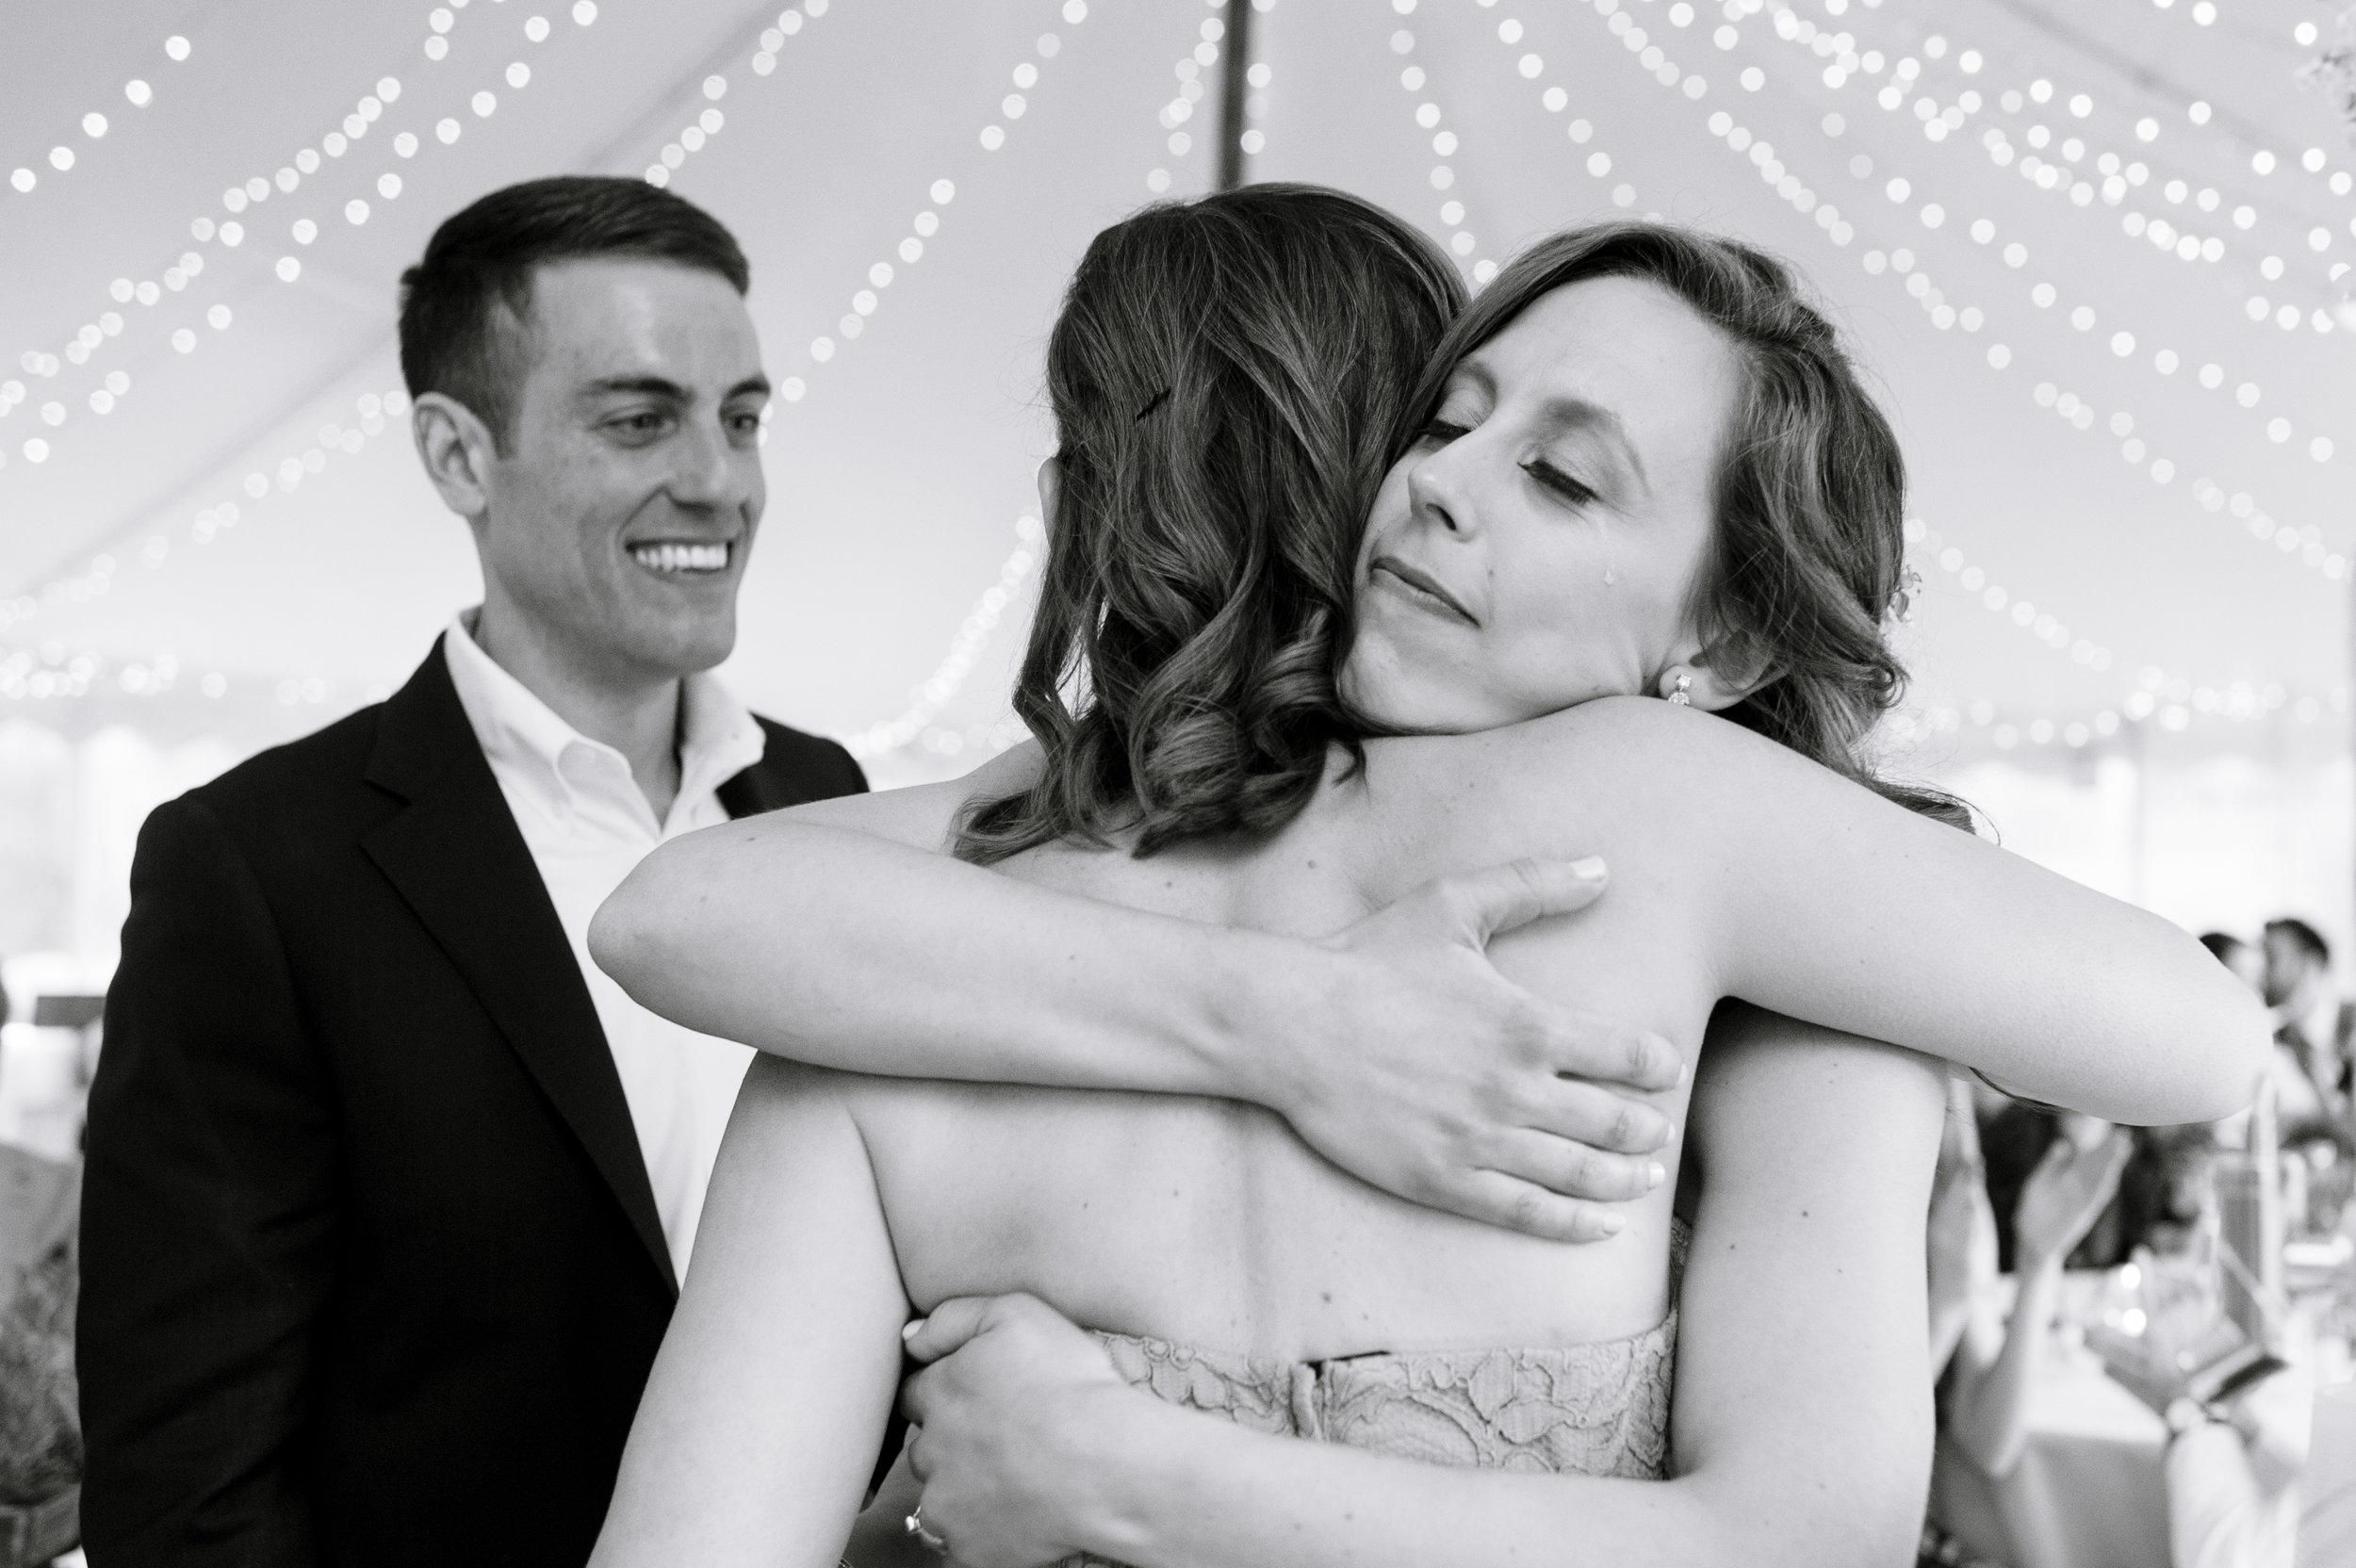 Candid-Wedding-Photography-Boston024.jpg